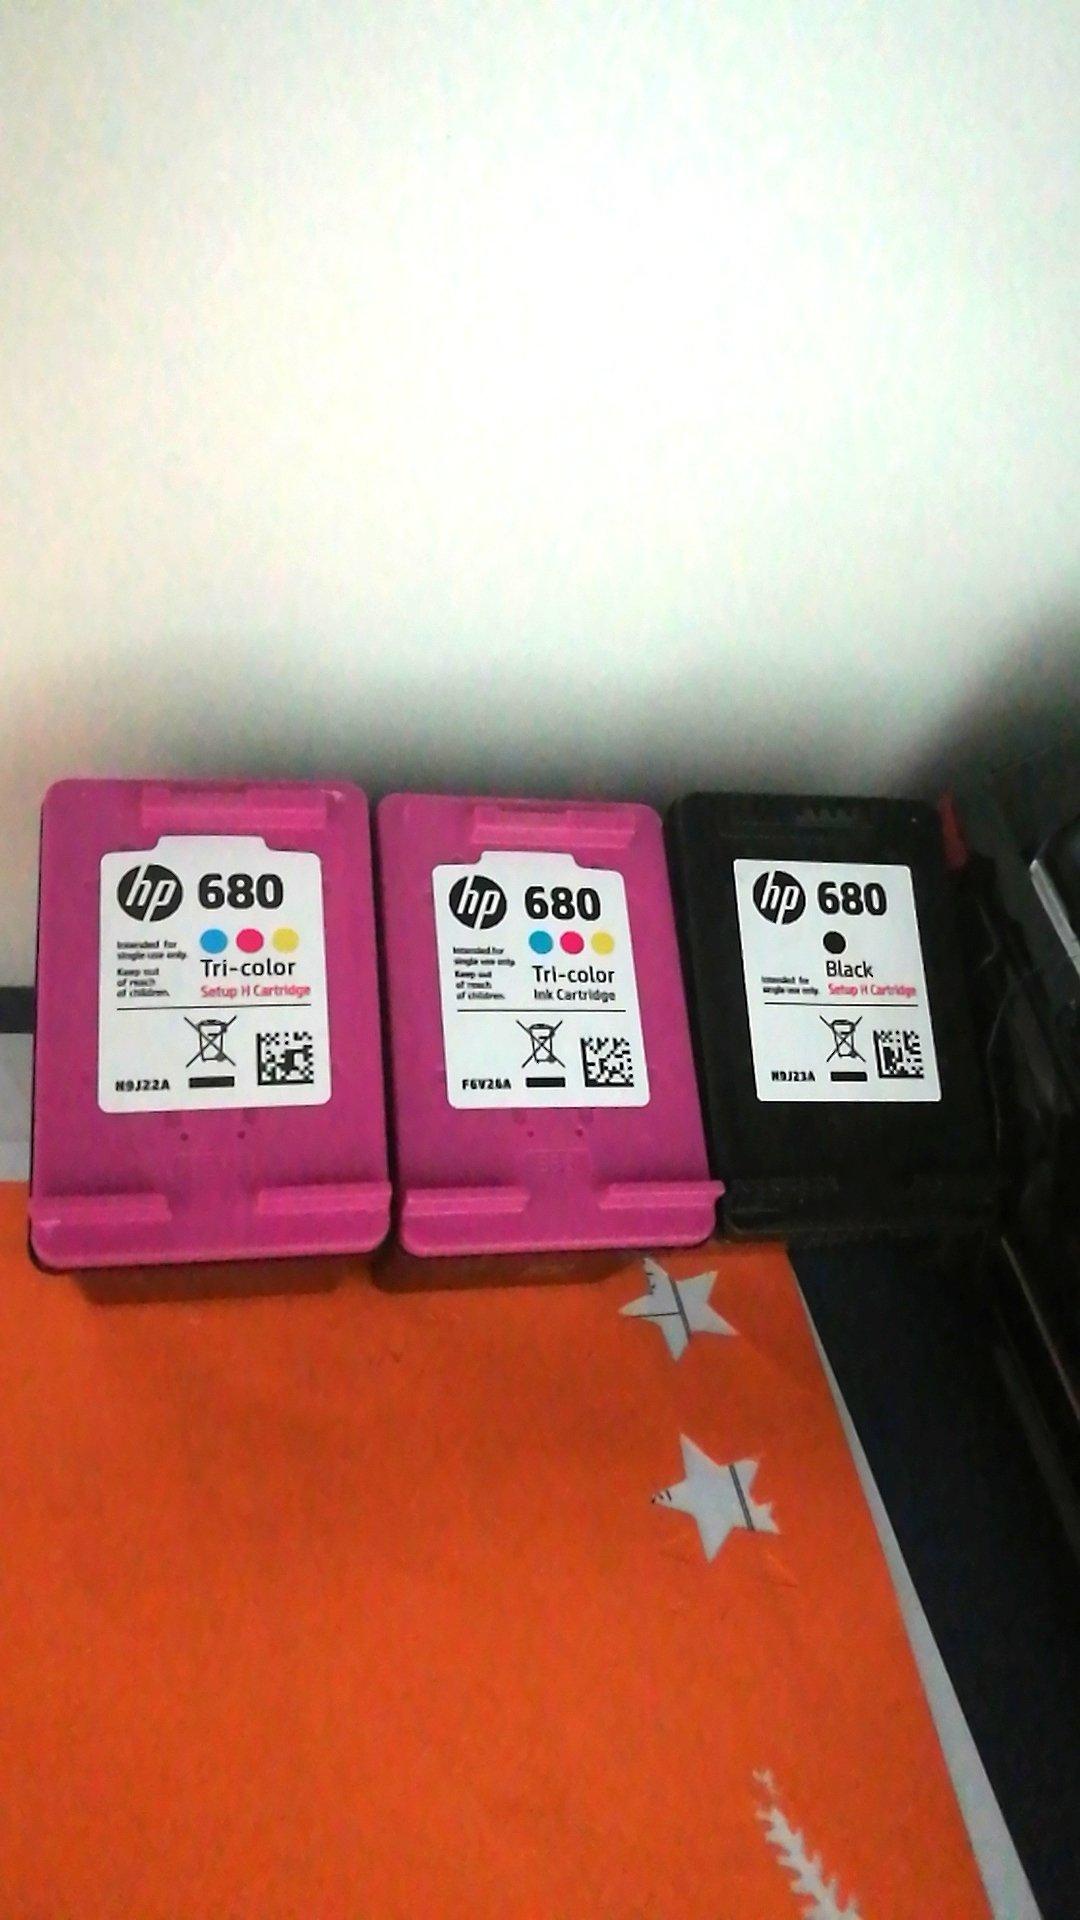 Hp 680 Cartridge Black Color Suit For 3638 3636 4678 3838 2138 Tinta Original Translating